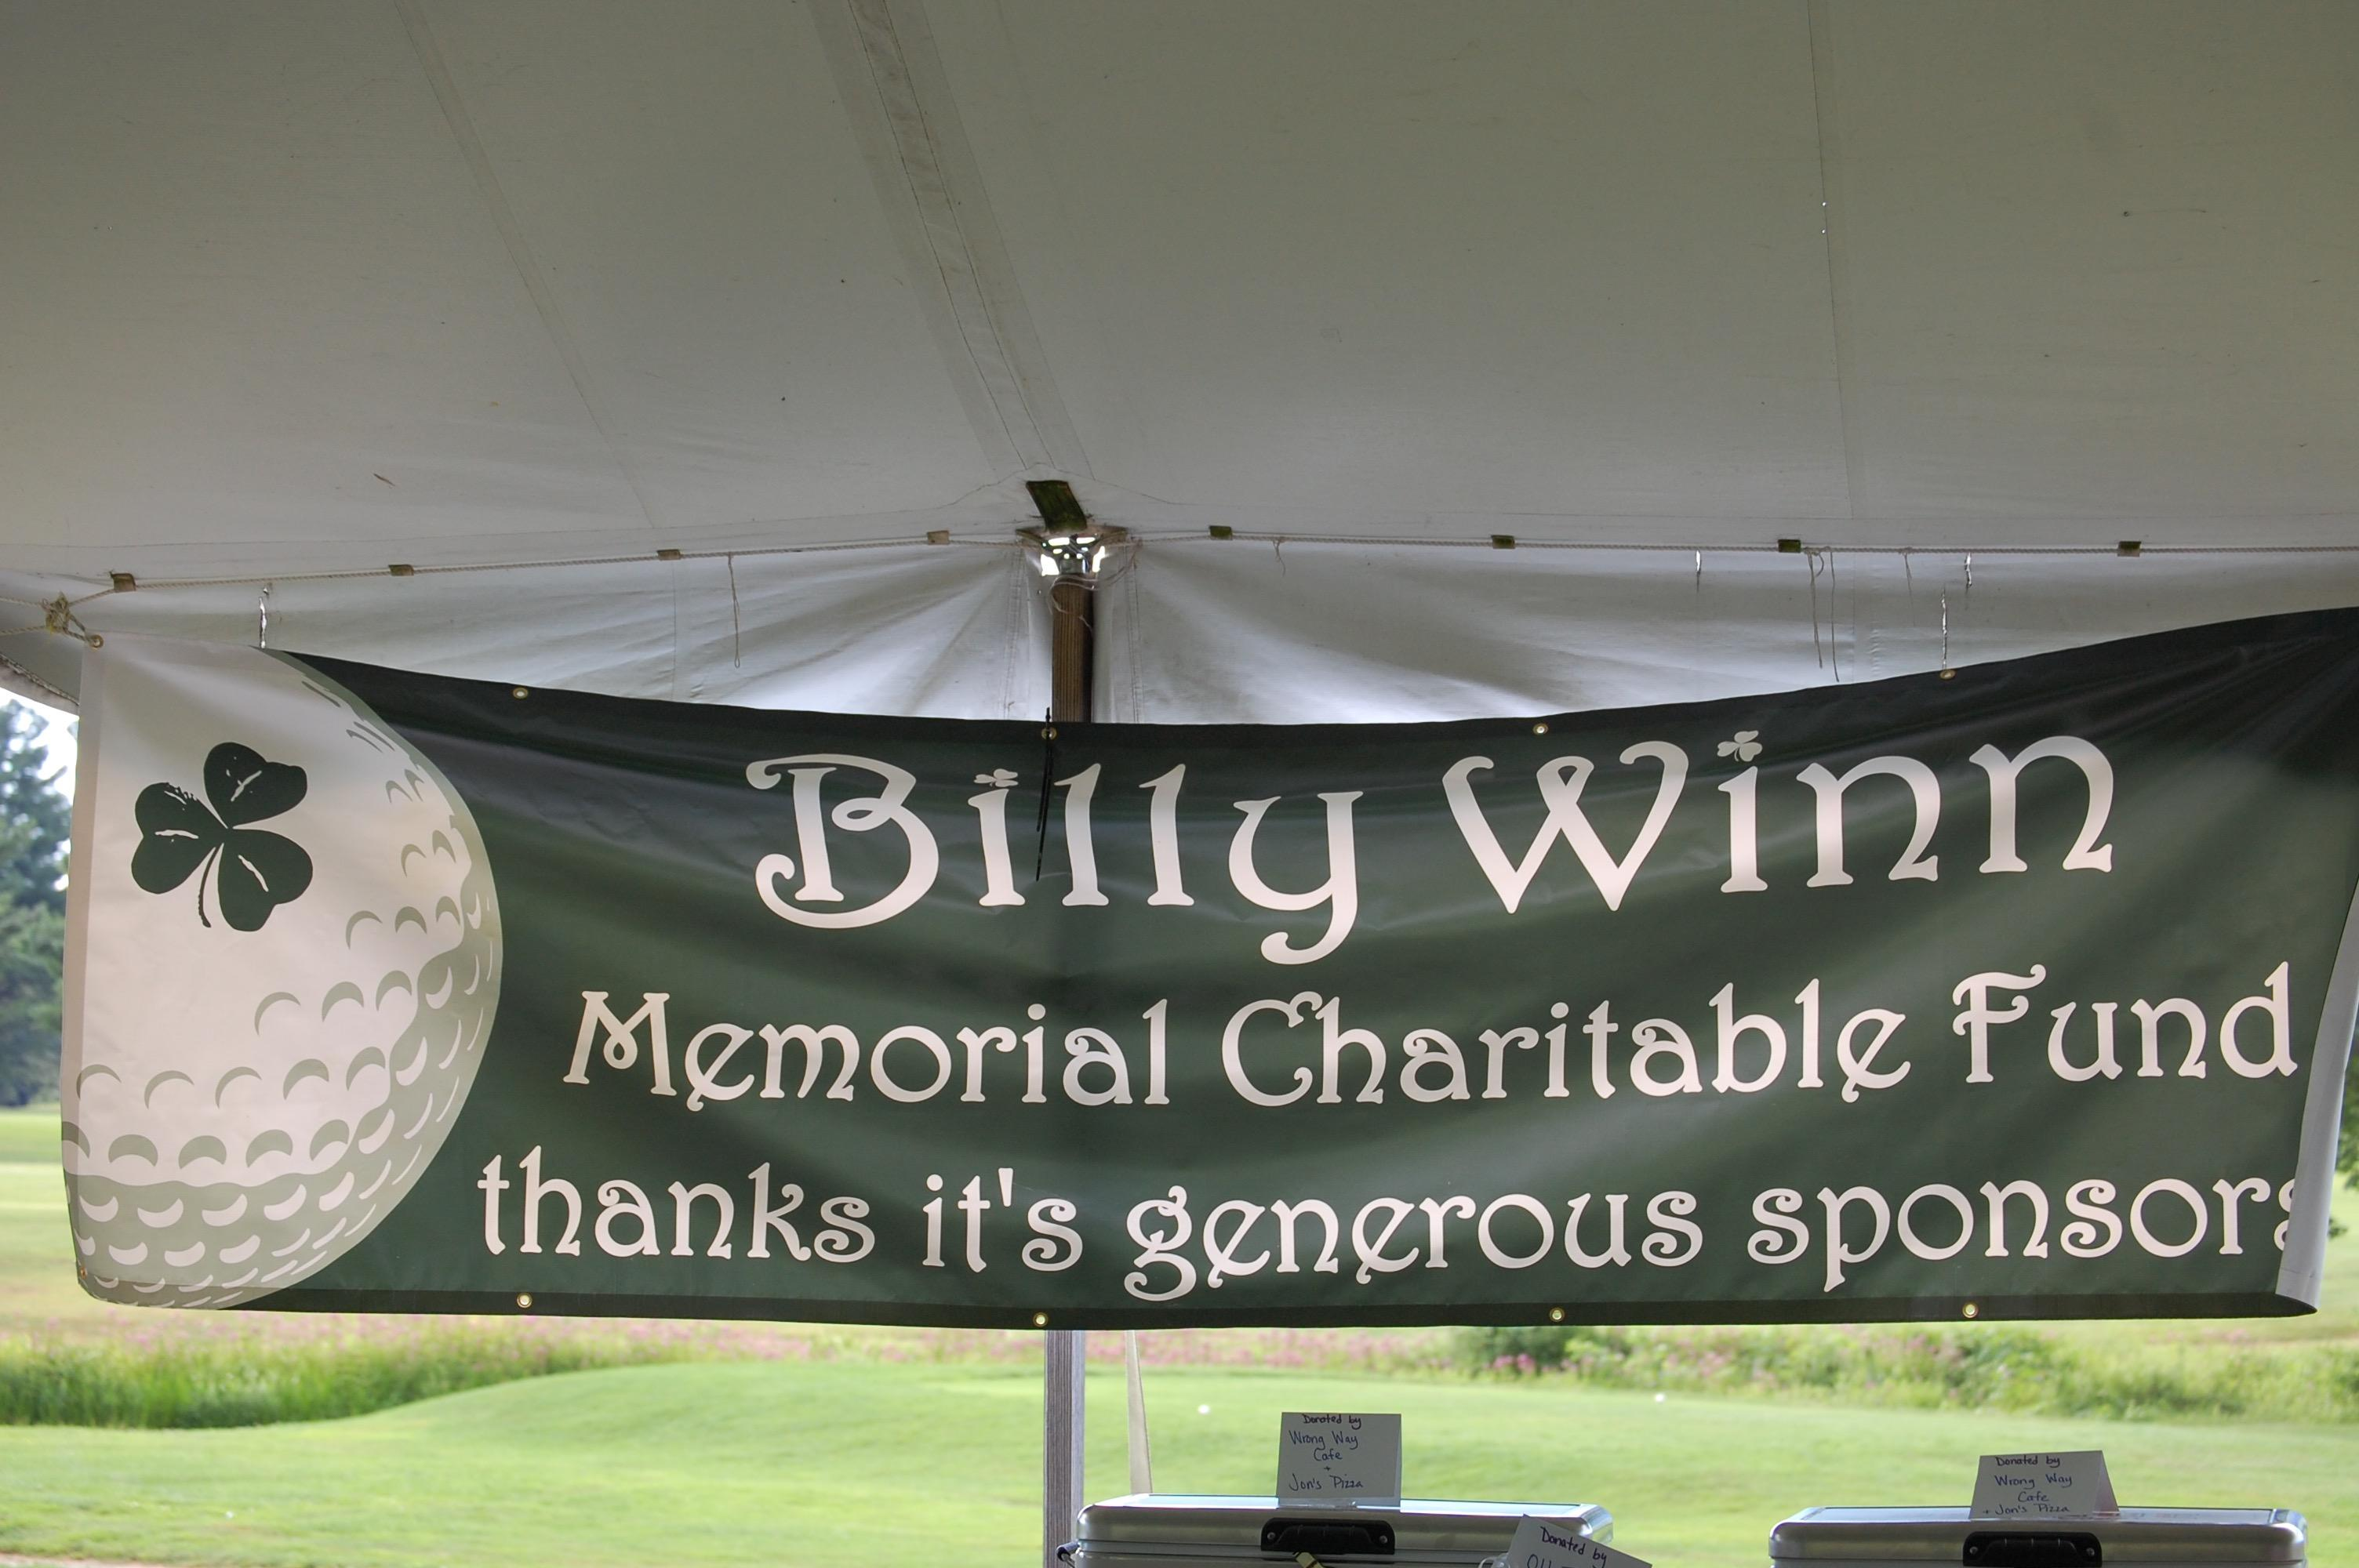 10th Annual Billy Winn Memorial Golf Tourney